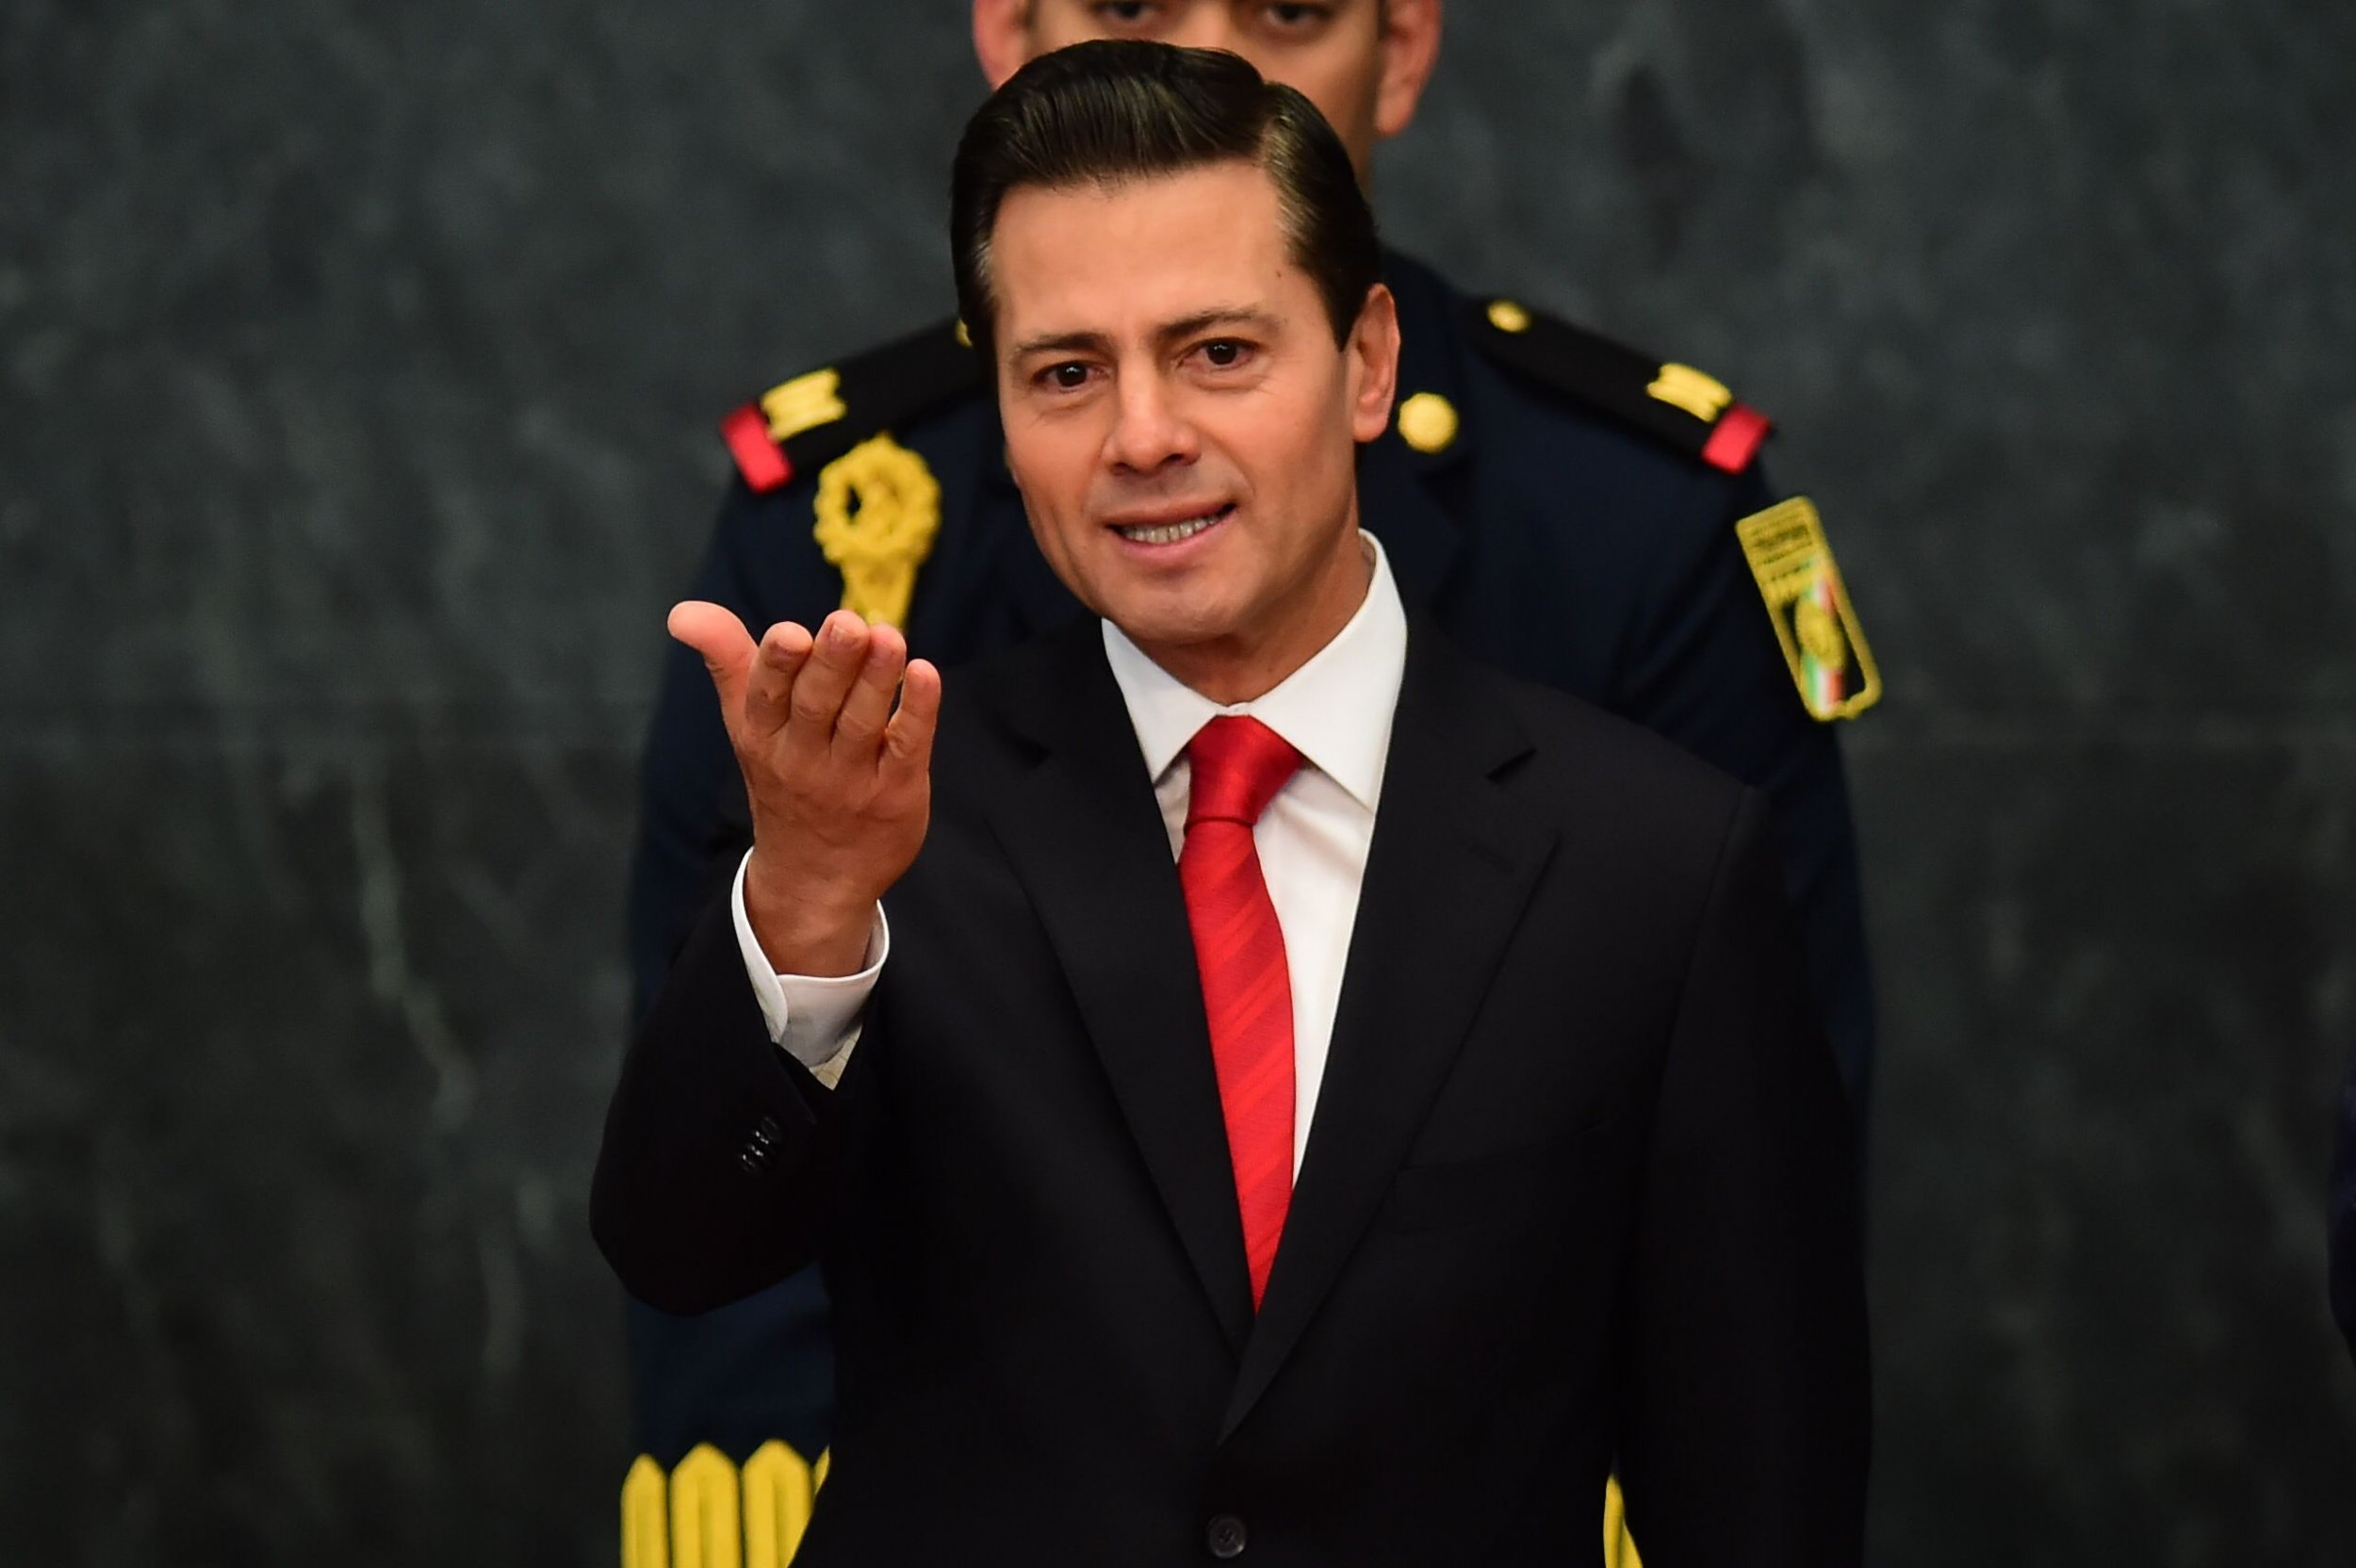 Mexican President Nieto